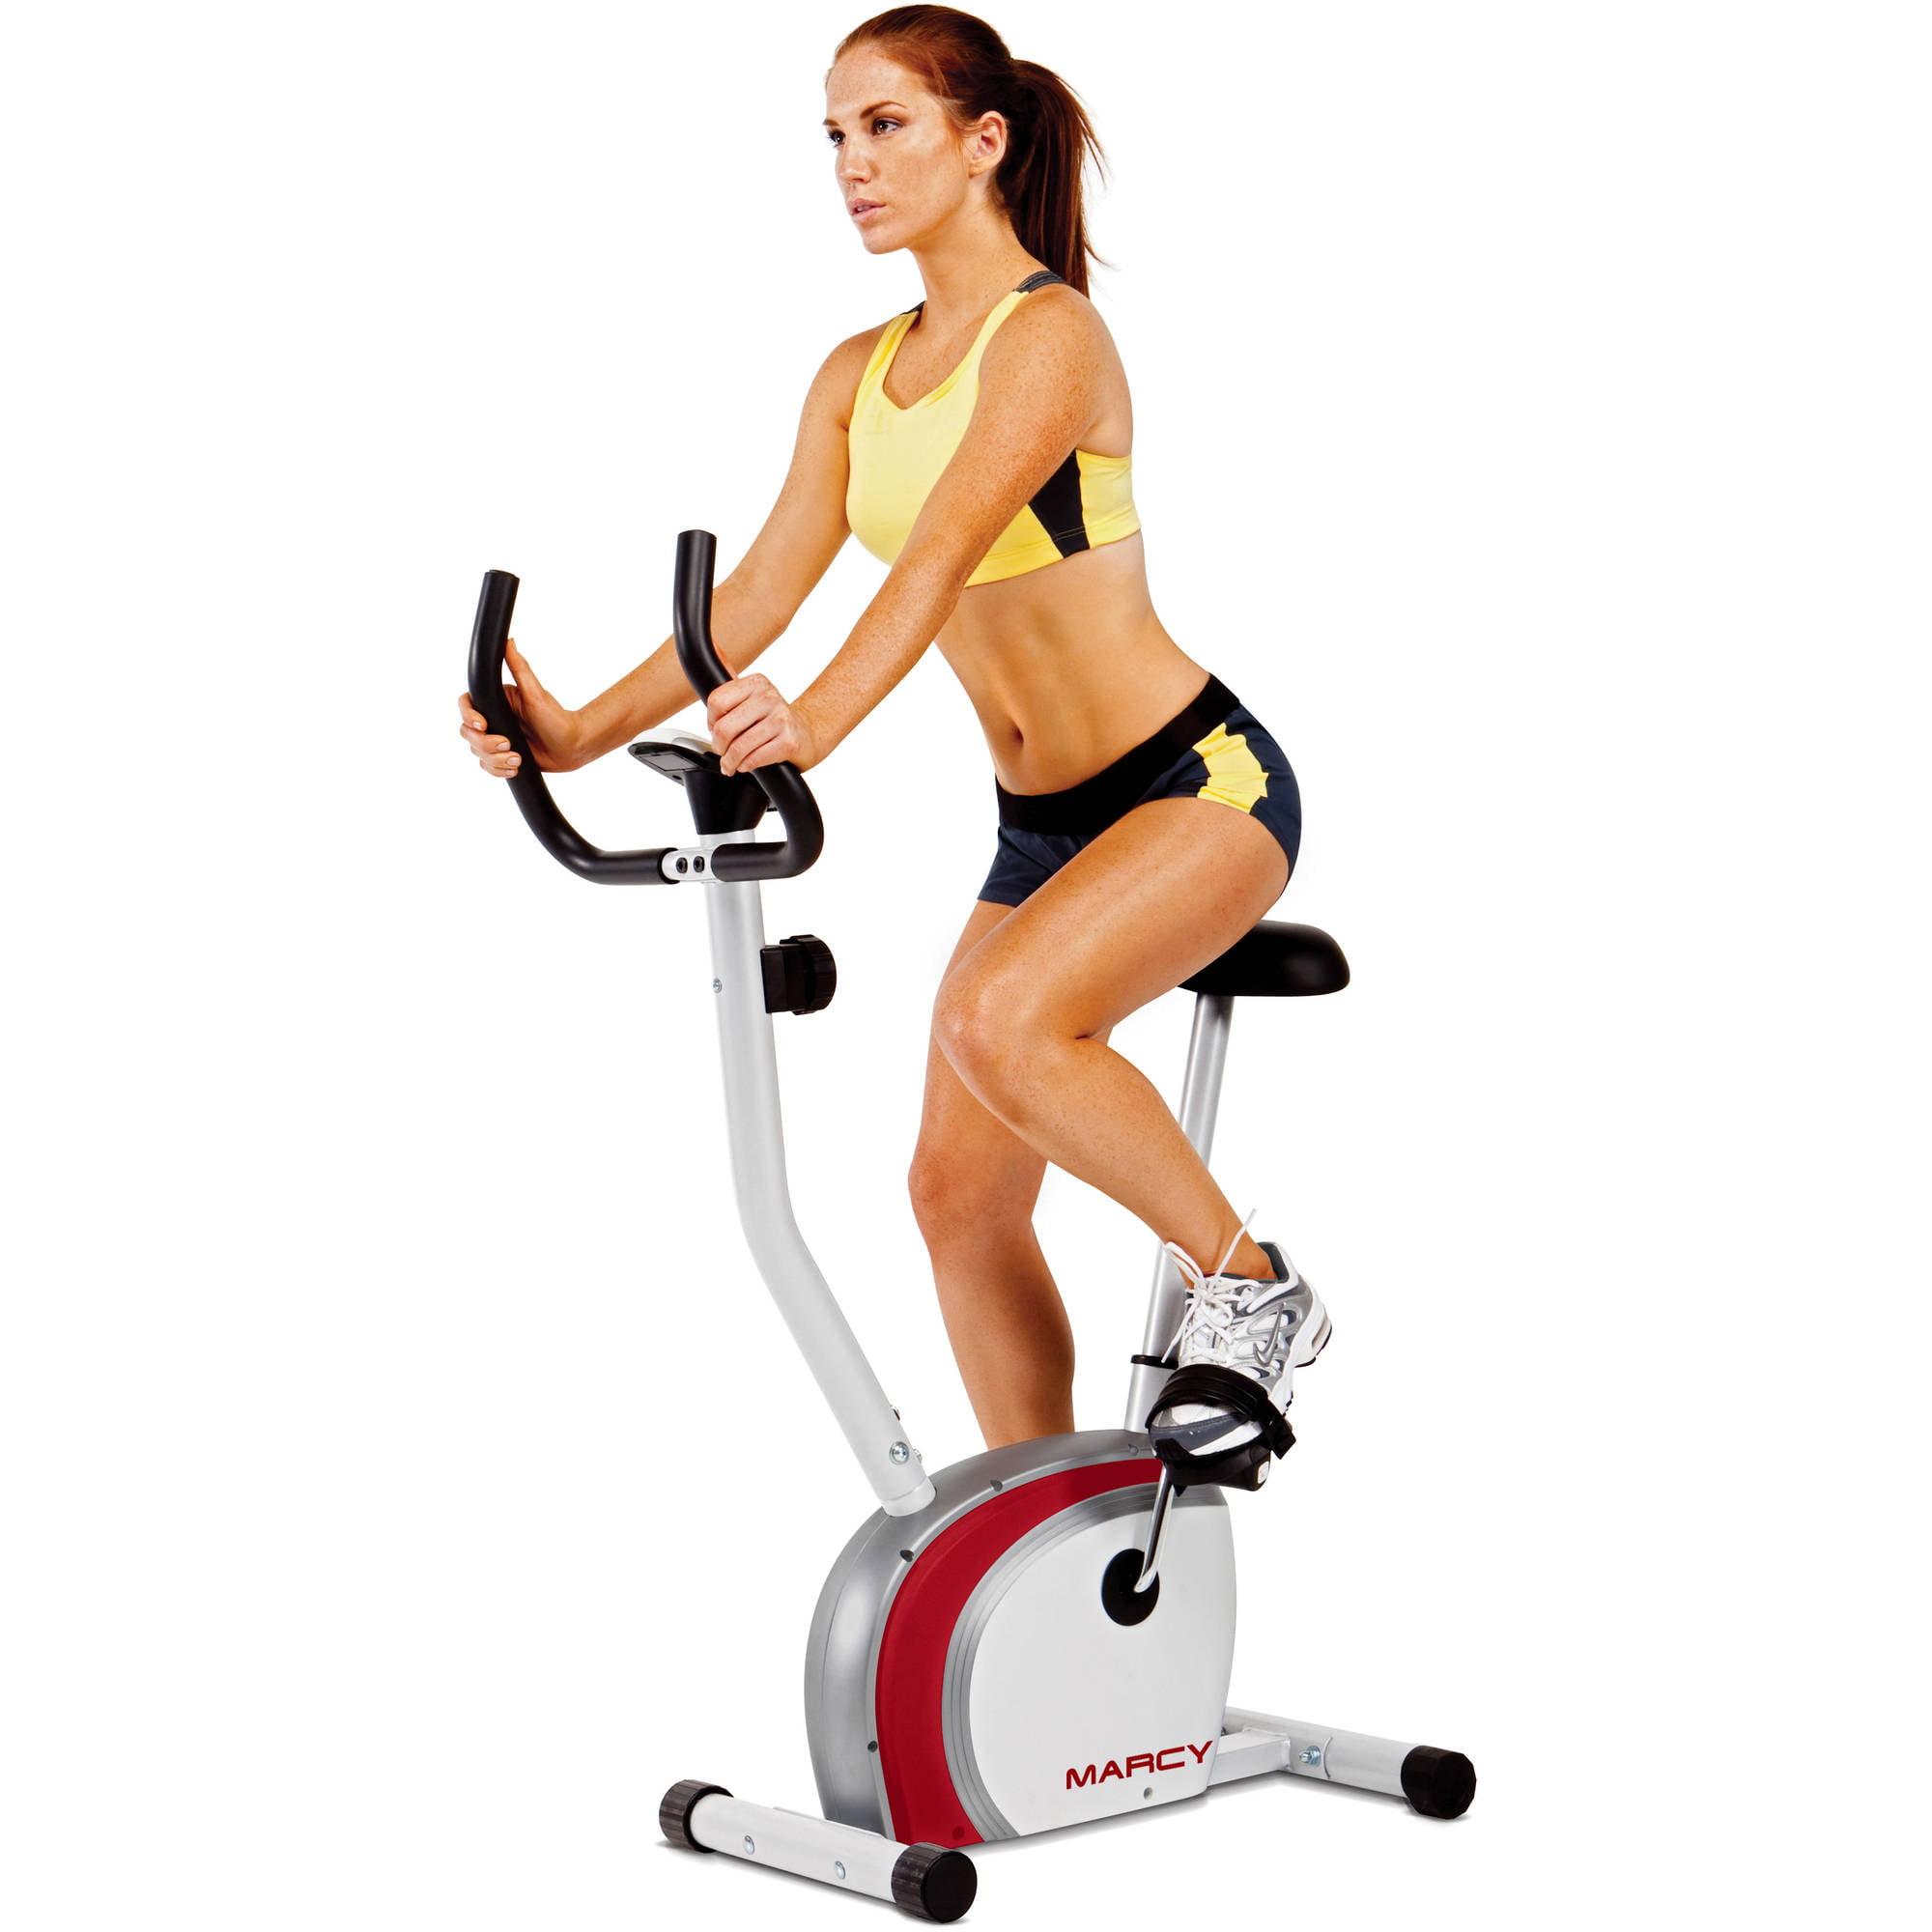 Marcy Upright Mag Exercise Bike